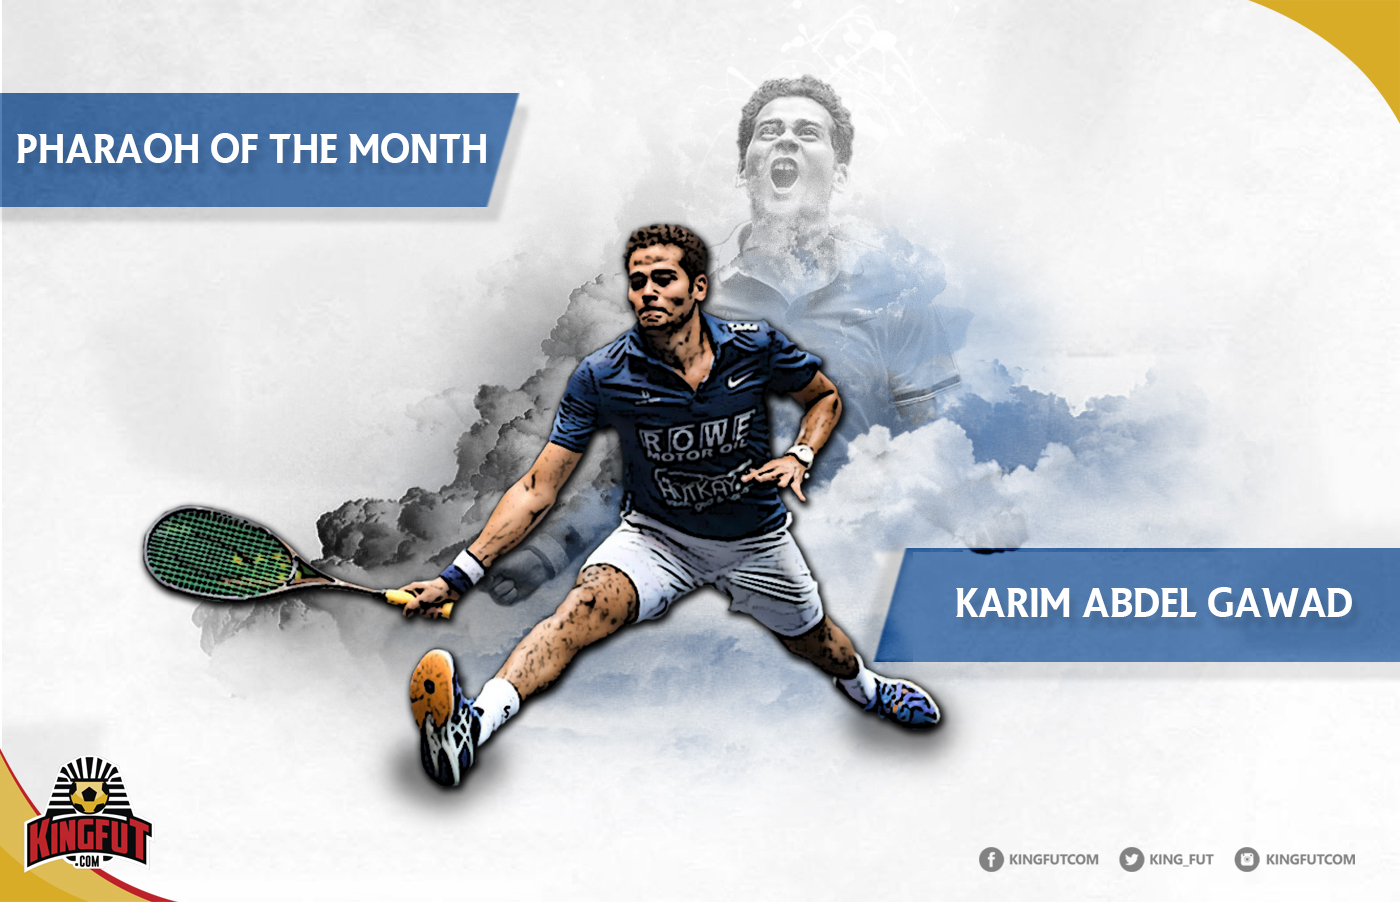 Karim Abdel Gawad